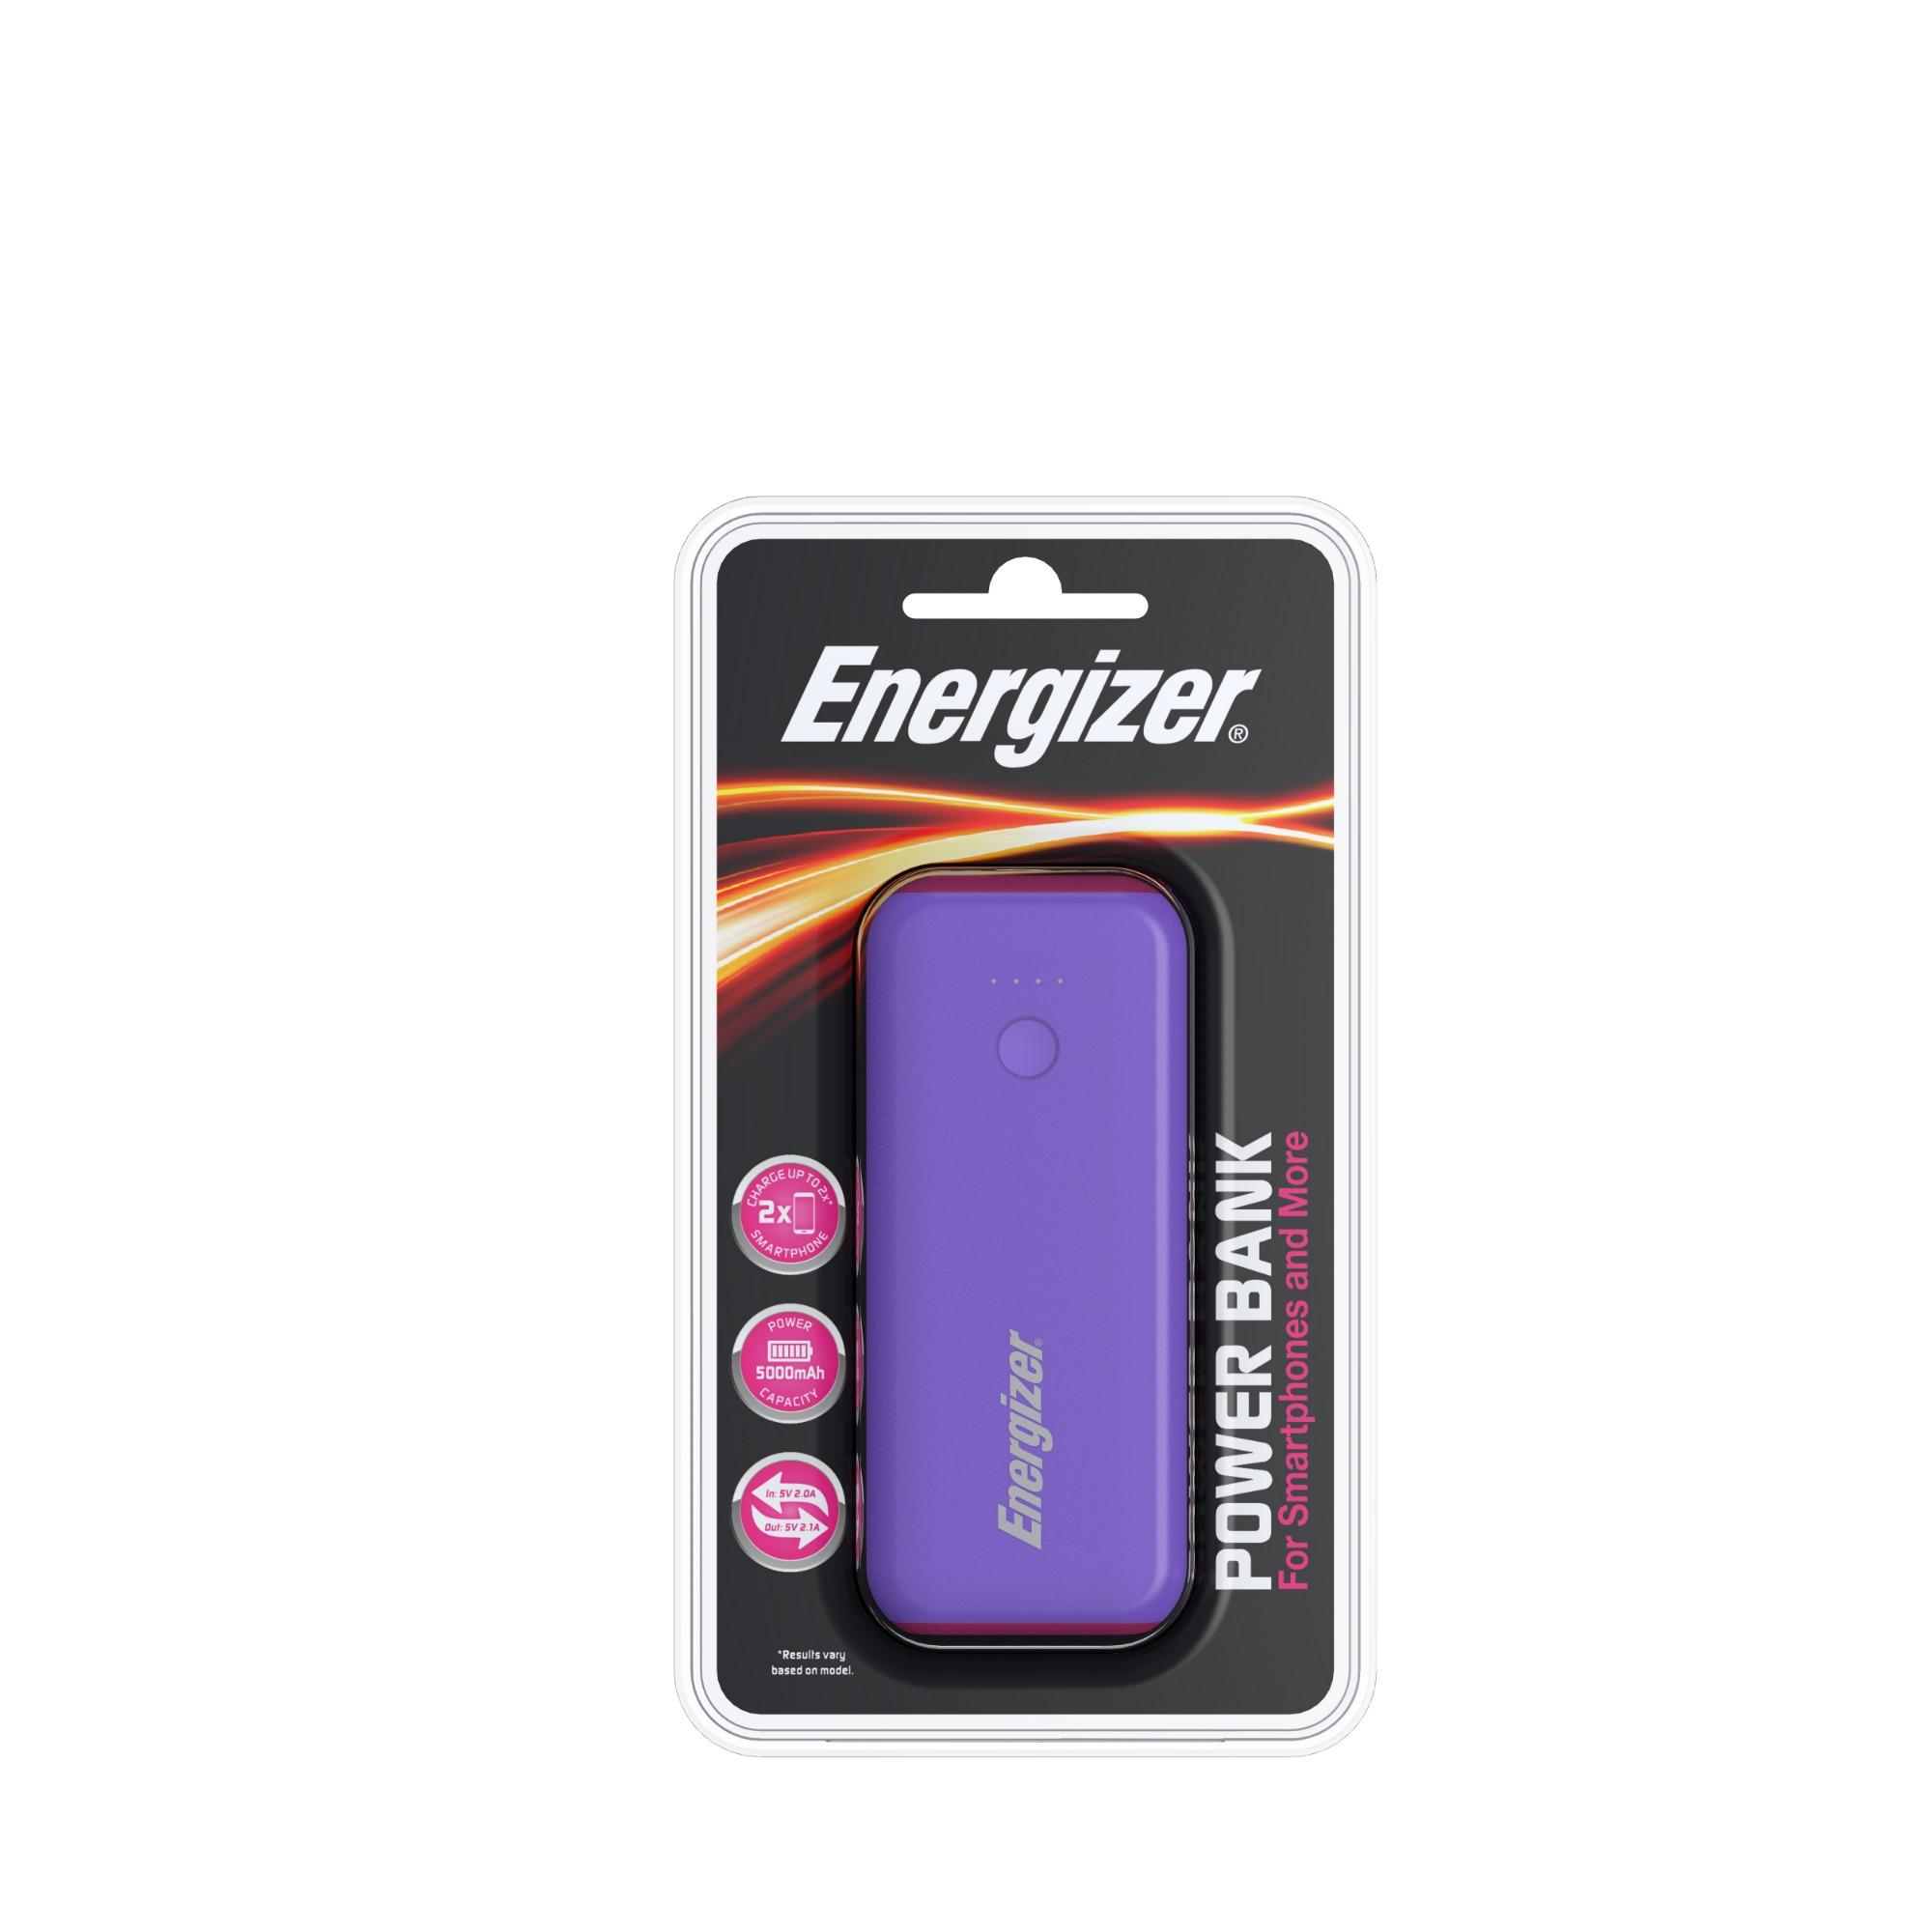 Energizer 5000mAh PowerBank PurpleMagenta